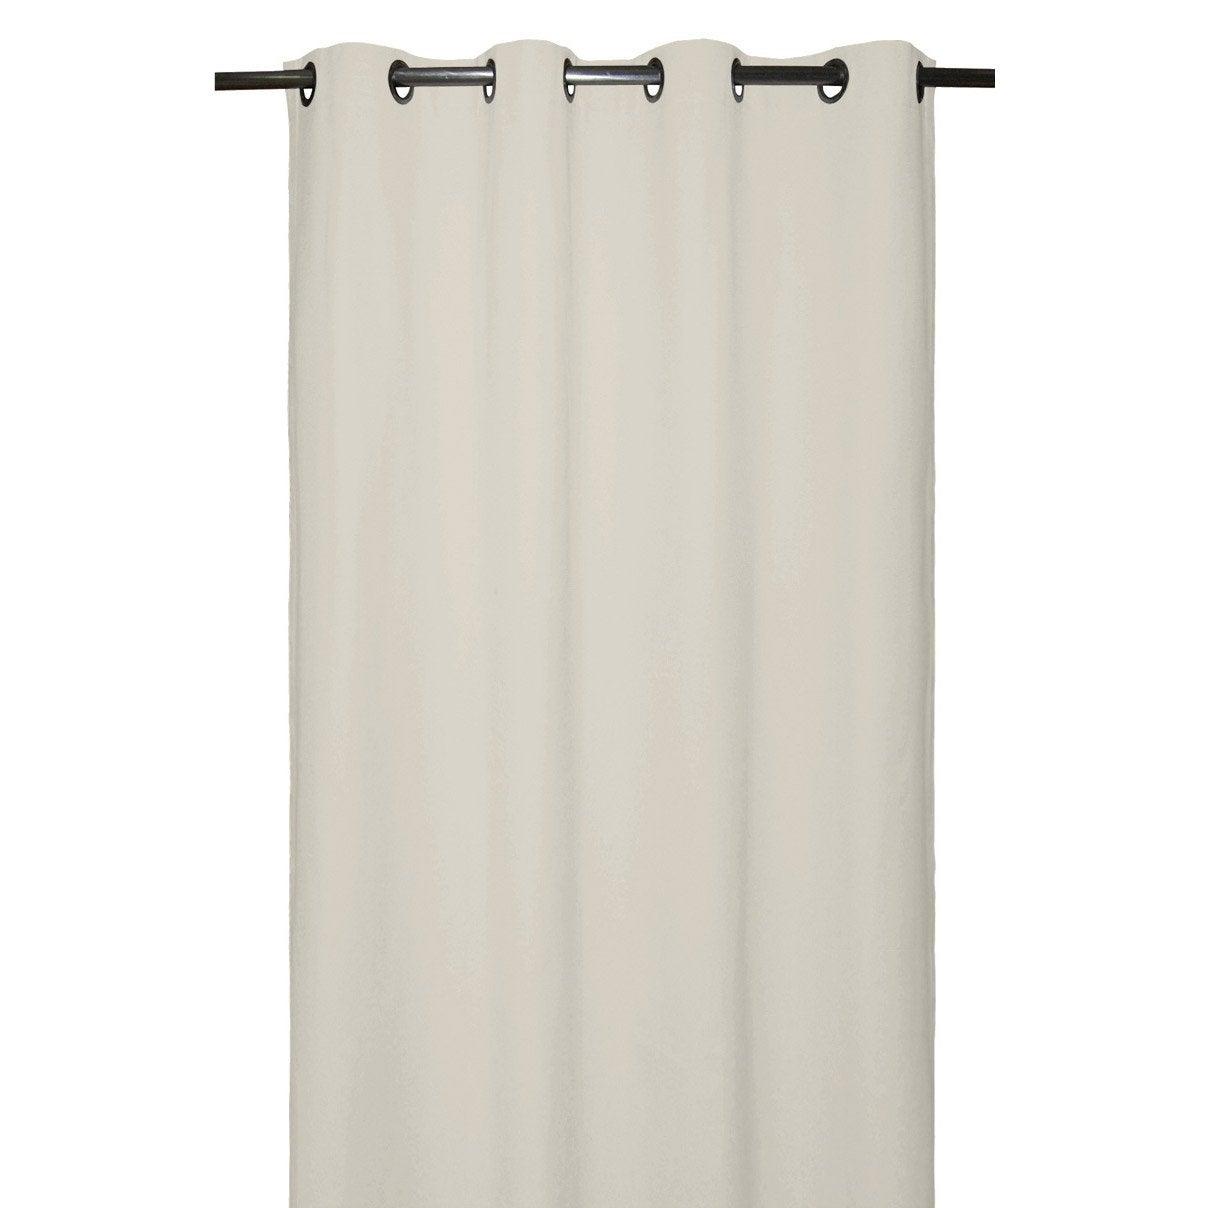 rideau bachet blanc lin n 1 x cm inspire. Black Bedroom Furniture Sets. Home Design Ideas